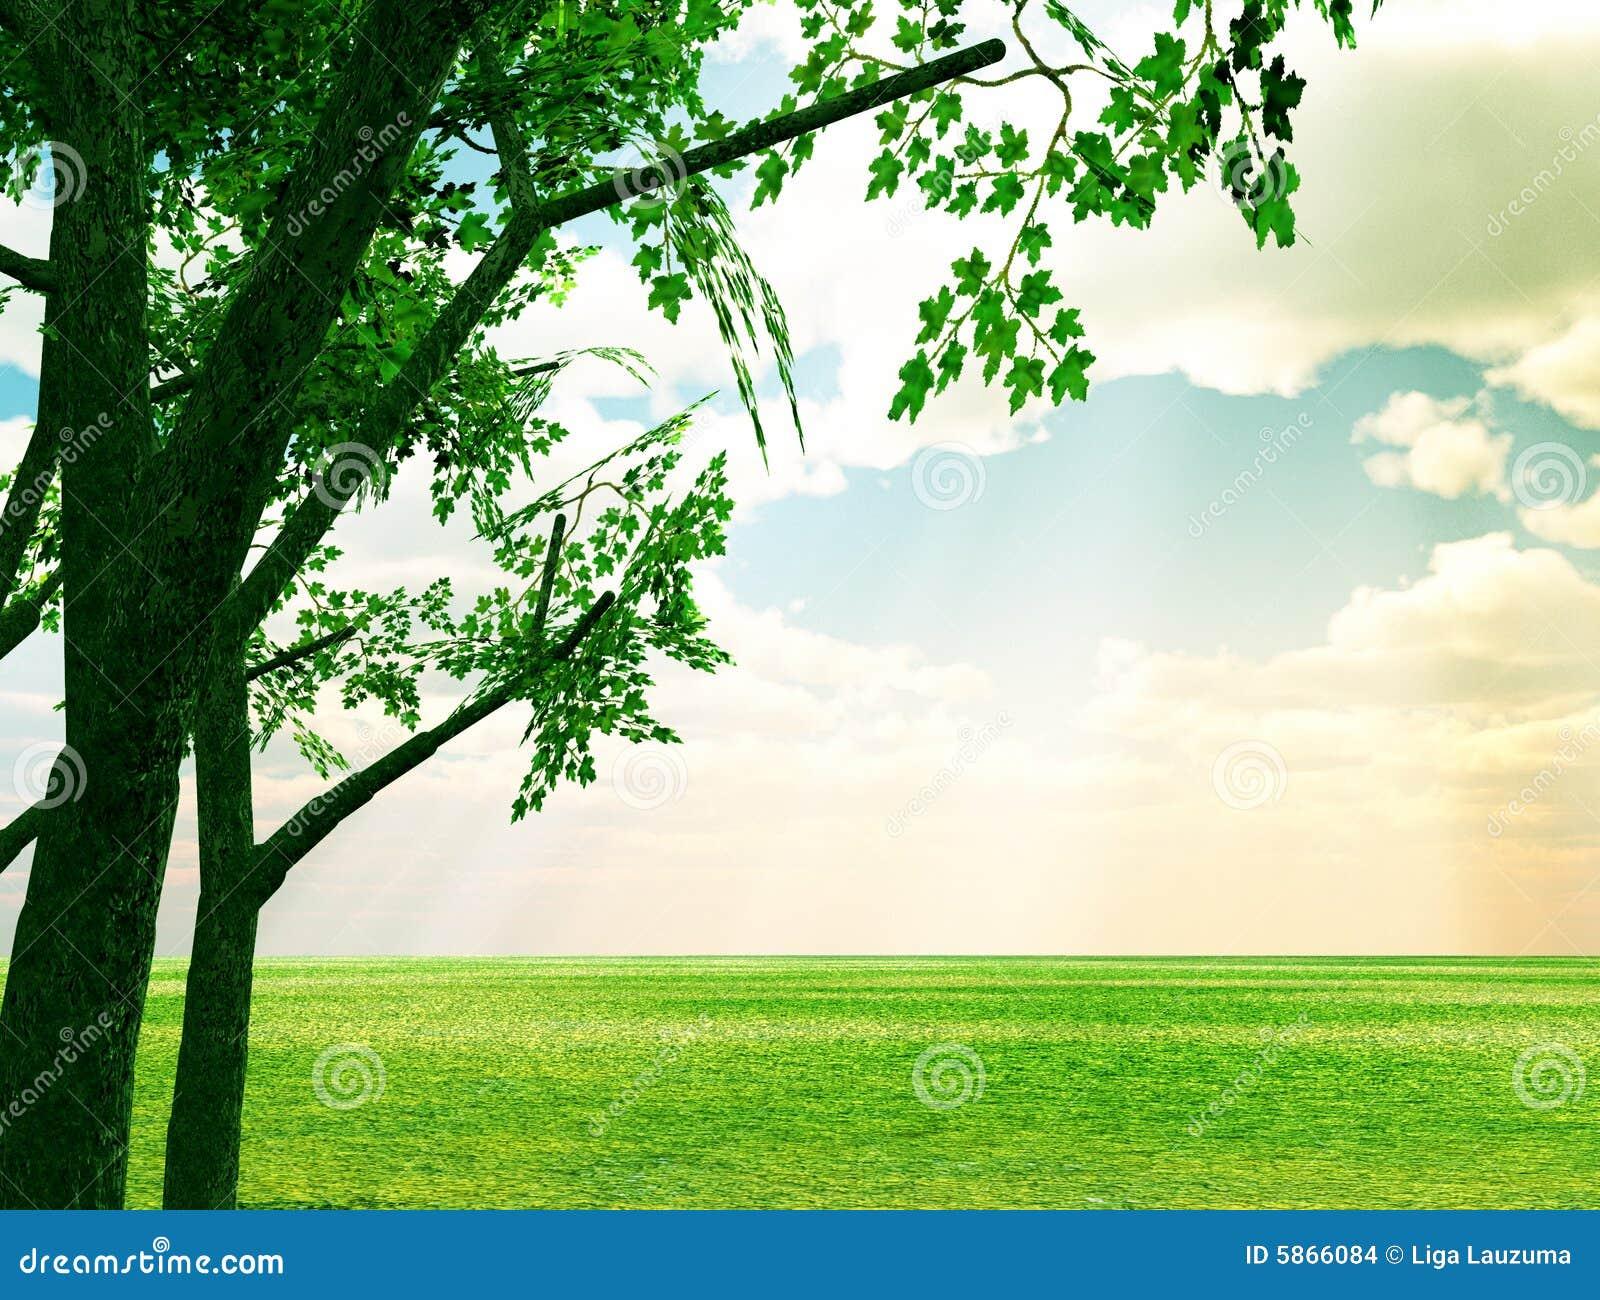 Spring Beautiful scenery